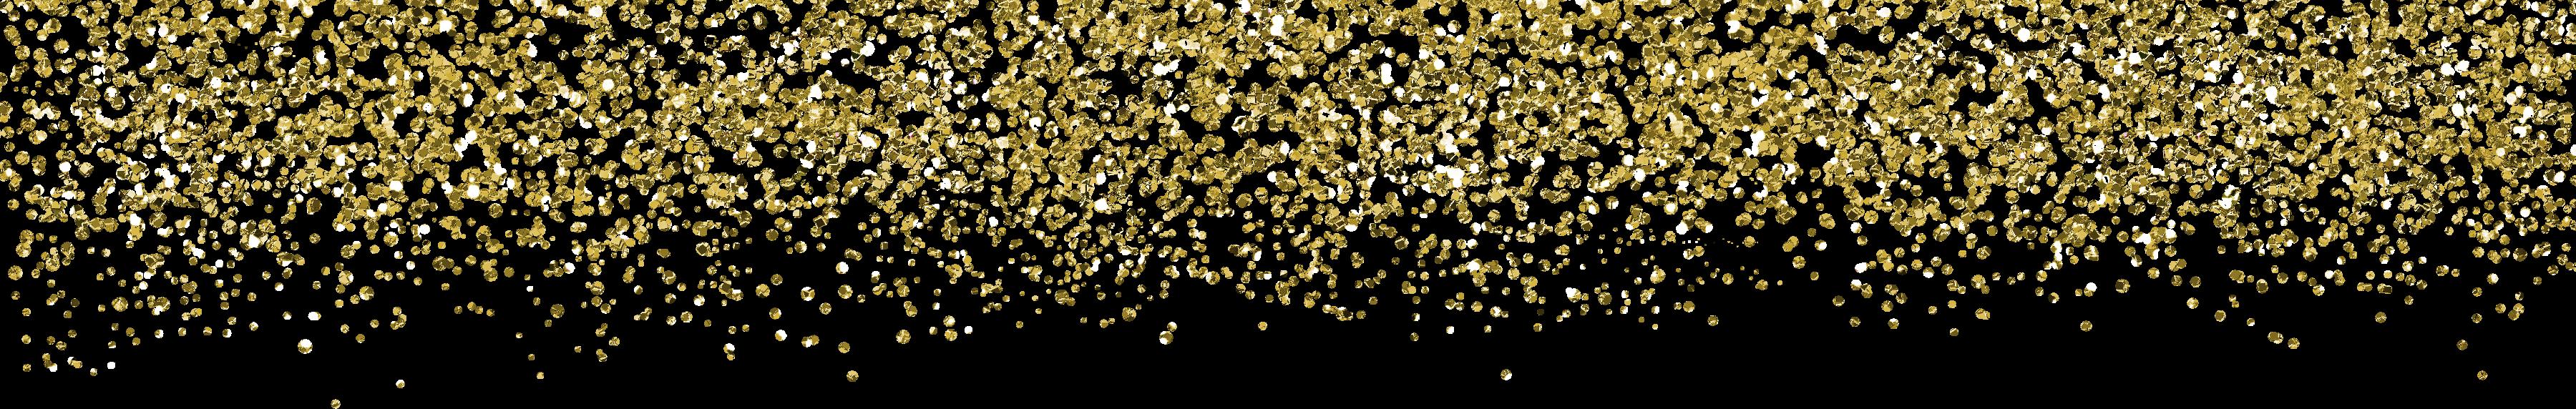 gold-glitter-border-6